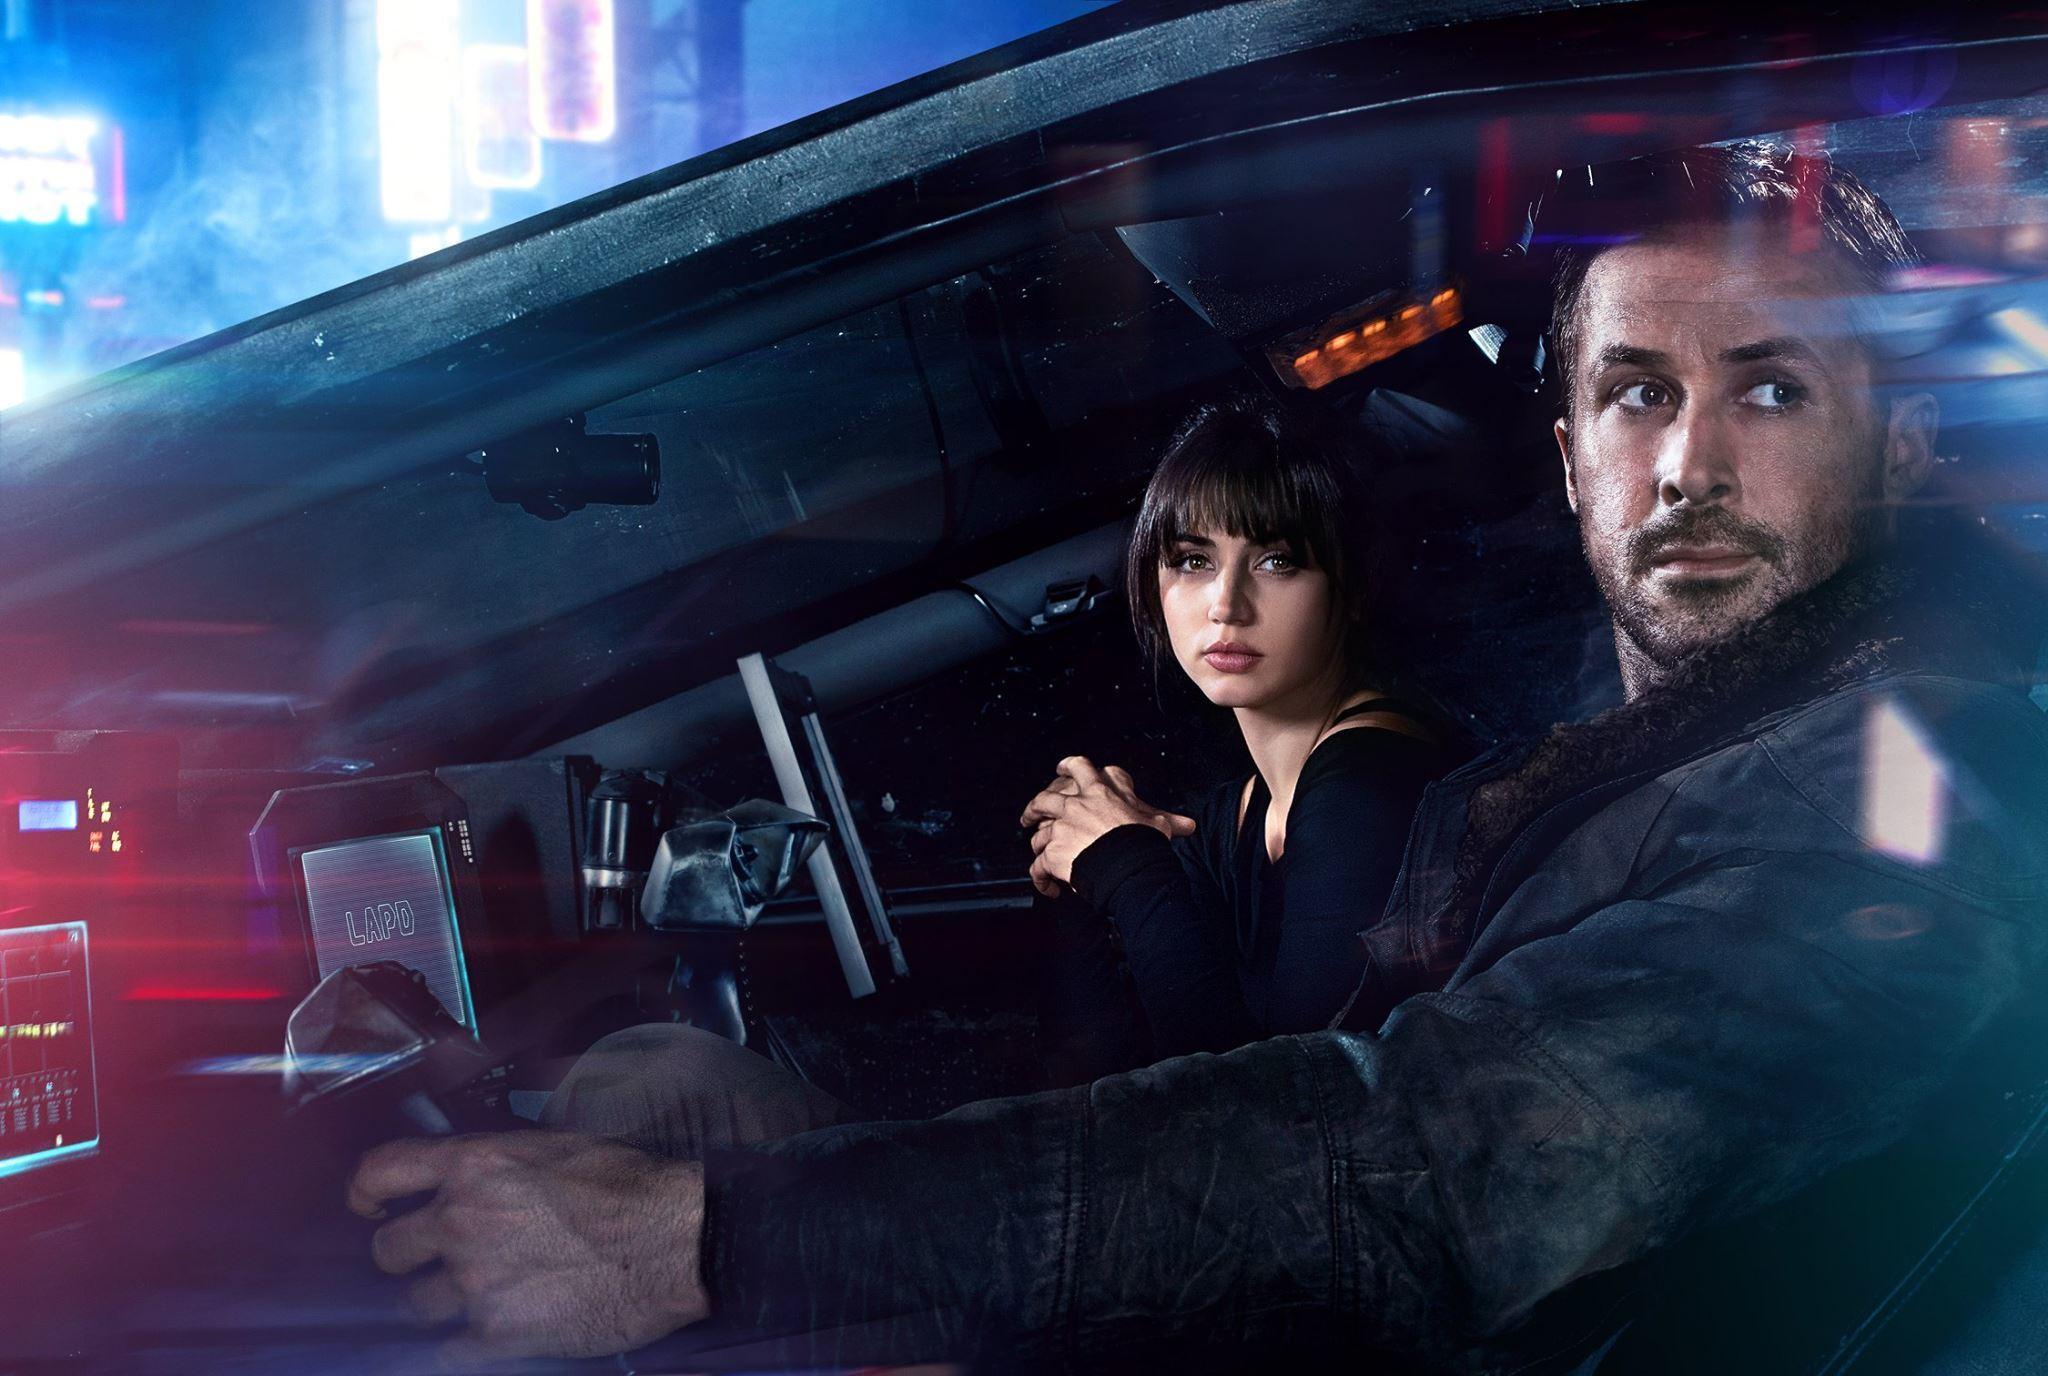 Ryan Gosling and Ana de Armas in Blade Runner 2049